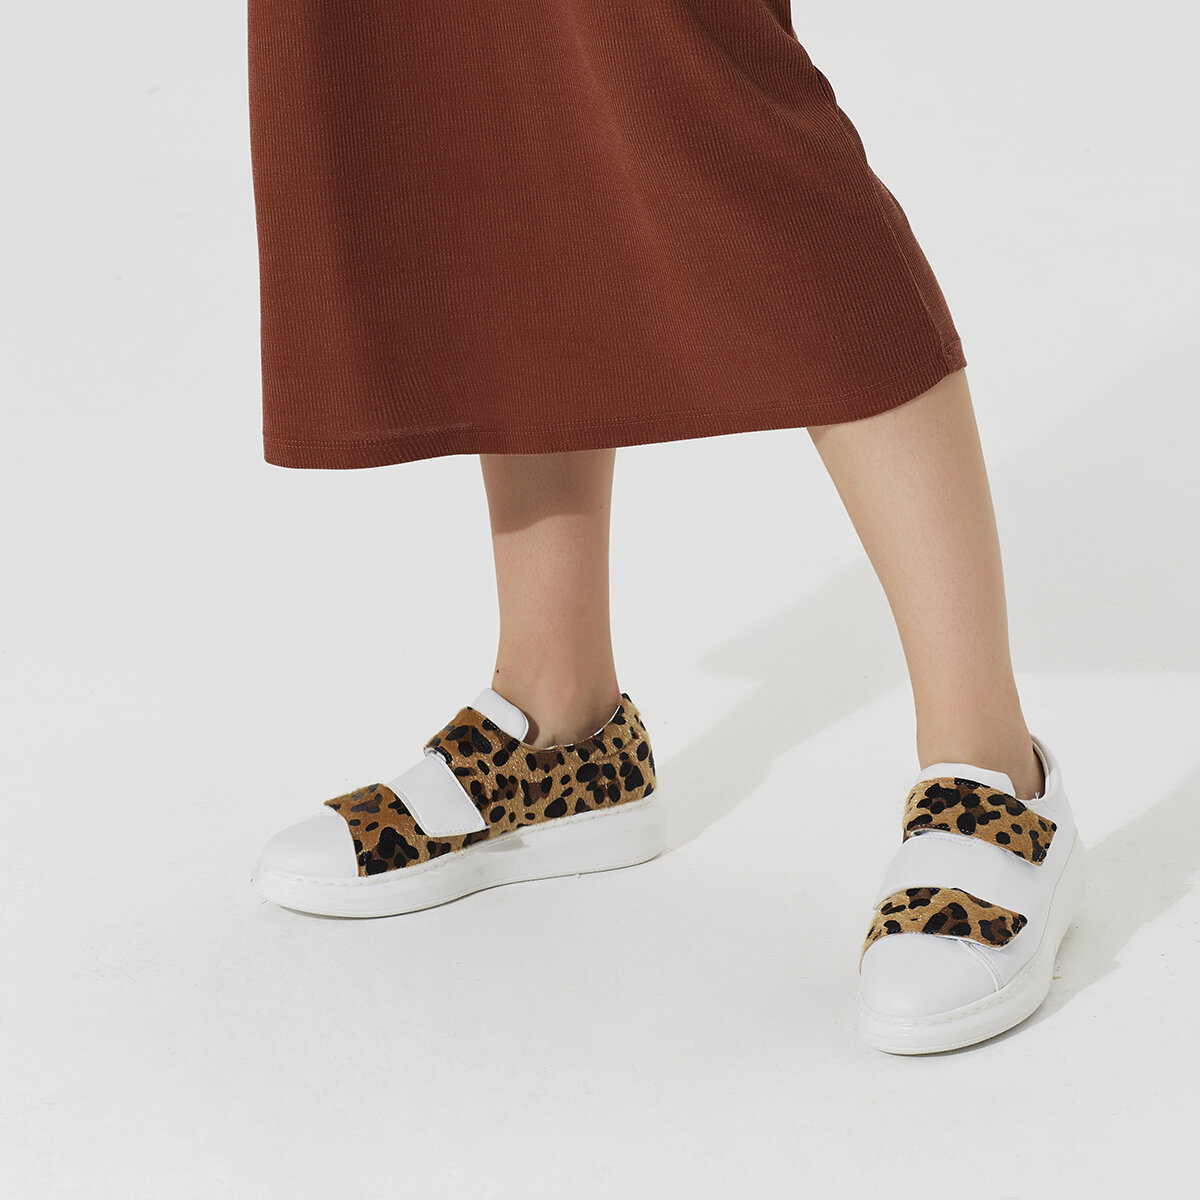 FLO CONTESSA01Z89Z White Women 'S Sneaker Shoes BUTIGO